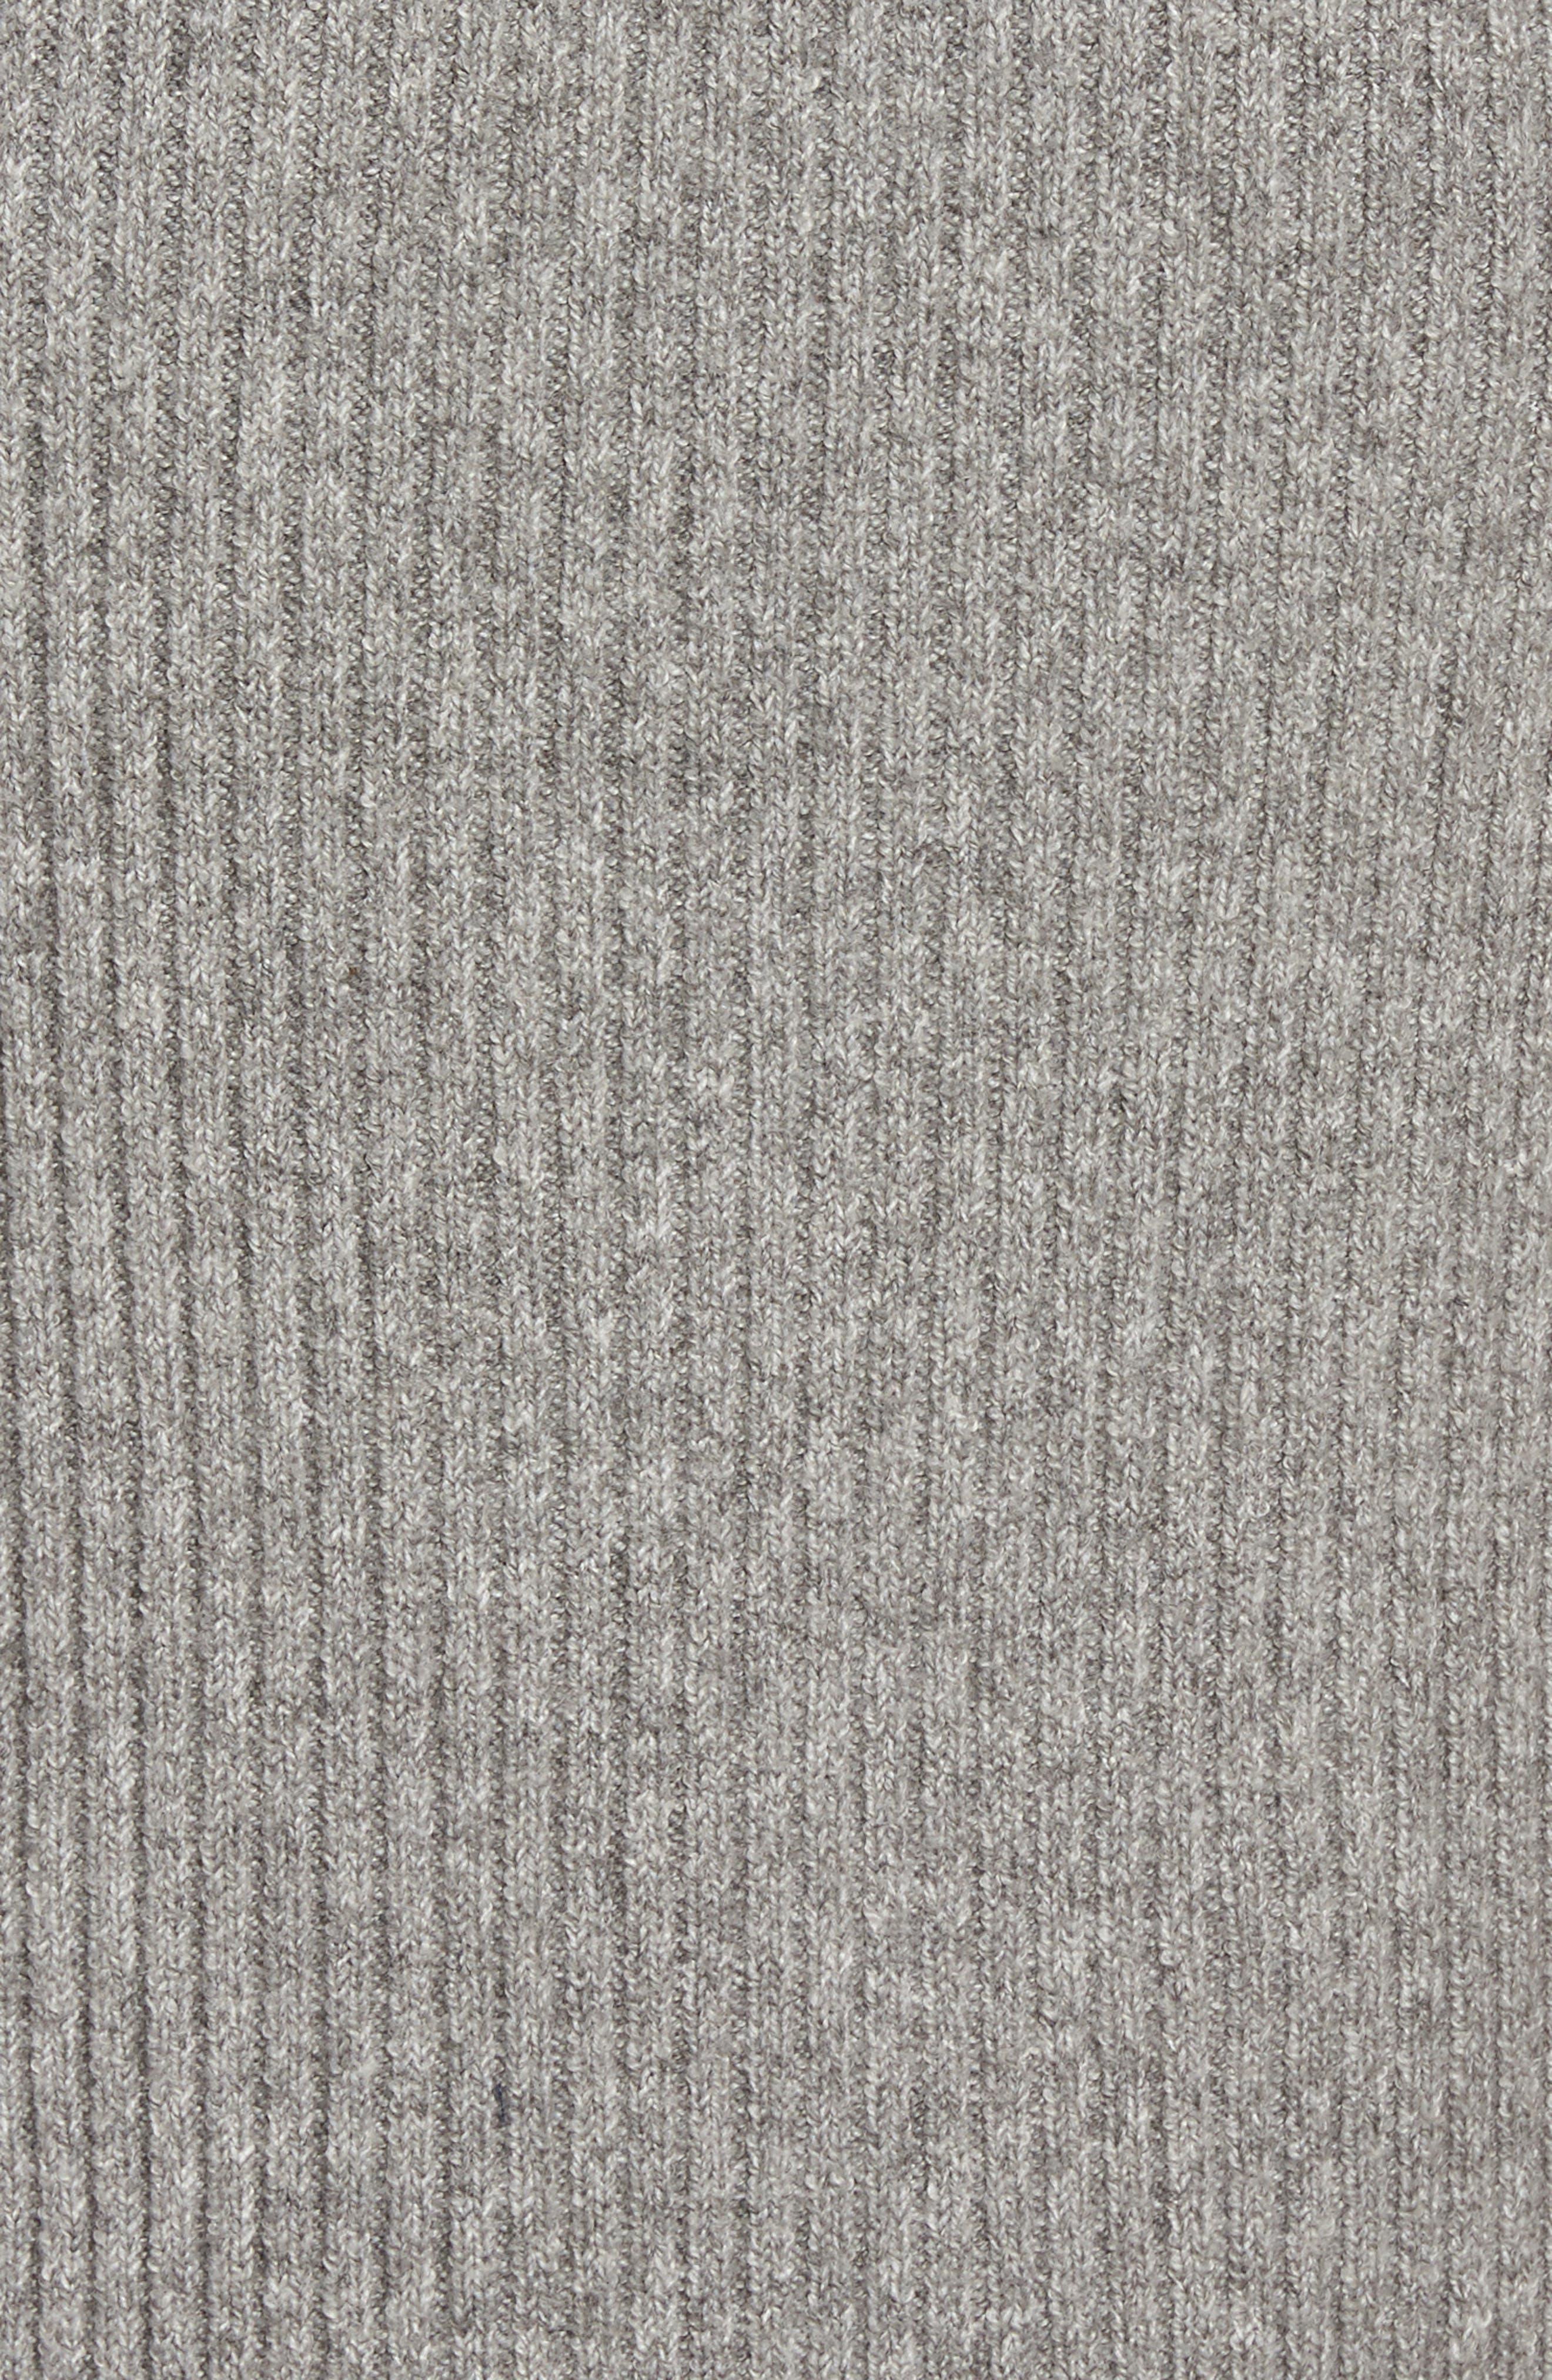 Ribbed Maxi Sweater Dress,                             Alternate thumbnail 5, color,